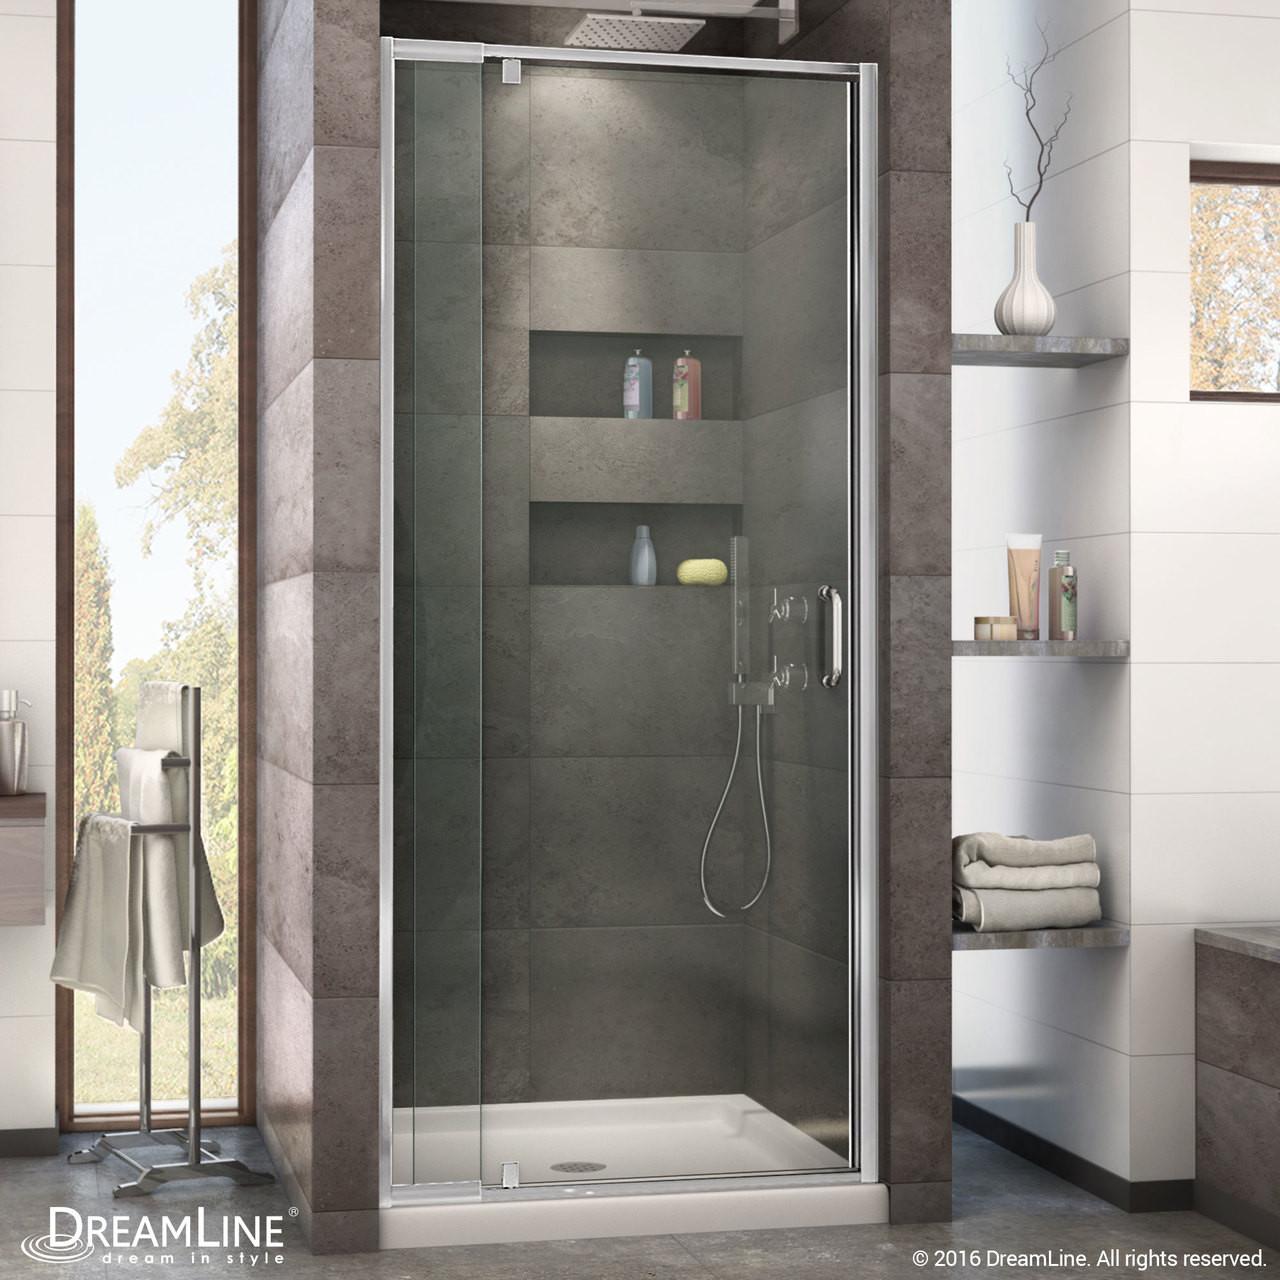 Dreamline Dl 6216c 01cl Flex 36 In W X 36 In D X 74 3 4 In H Frameless Shower Door And Base Kit Chrome Hardware